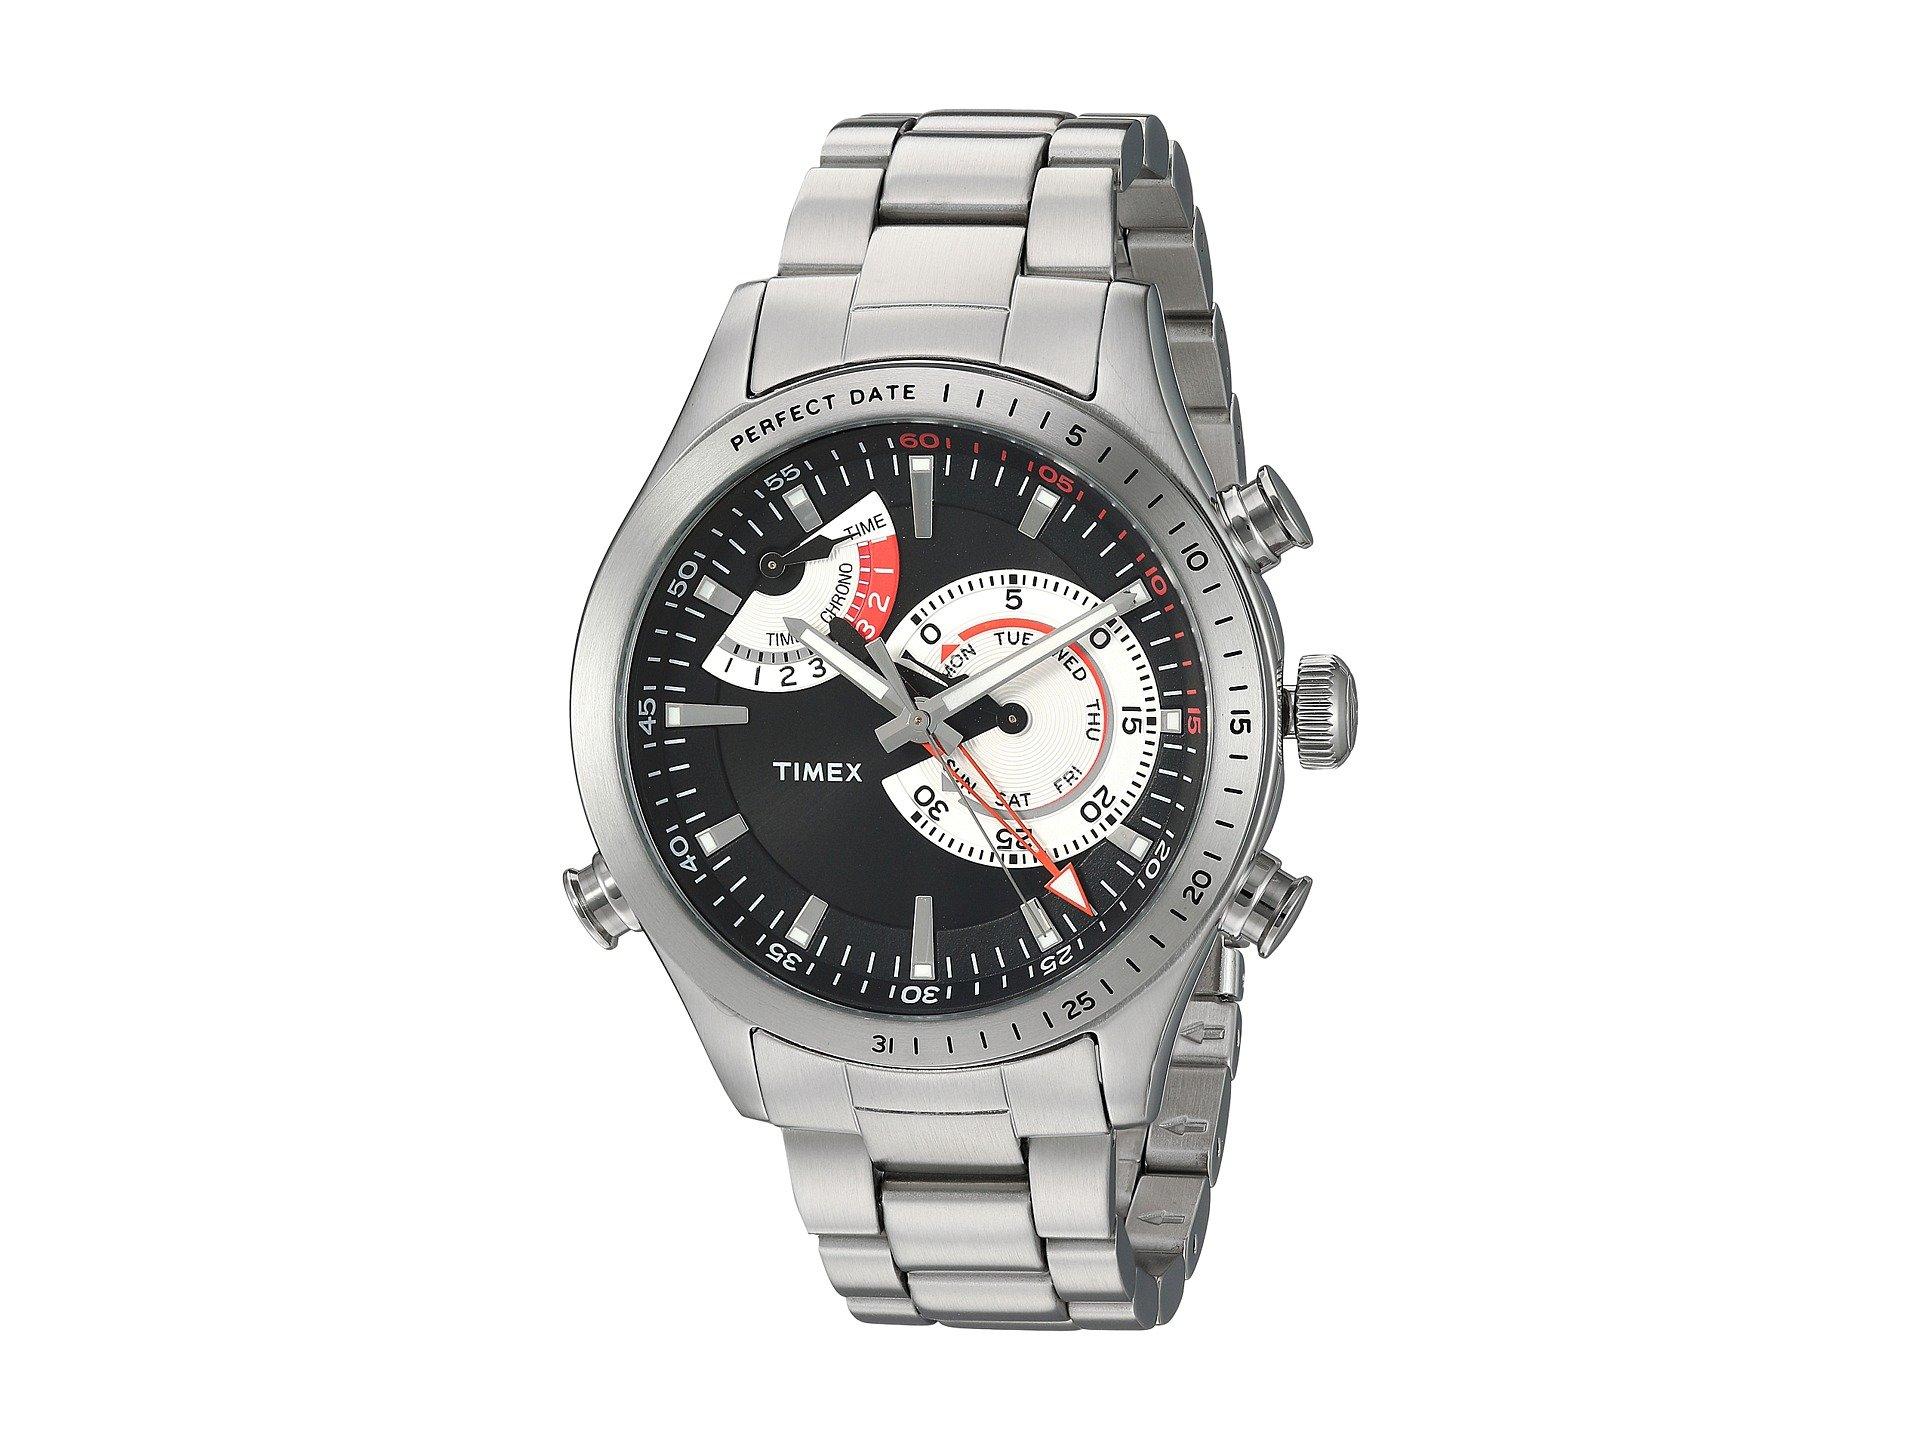 Reloj para Hombre Timex Intelligent Quartz® Chrono Timer  + Timex en VeoyCompro.net